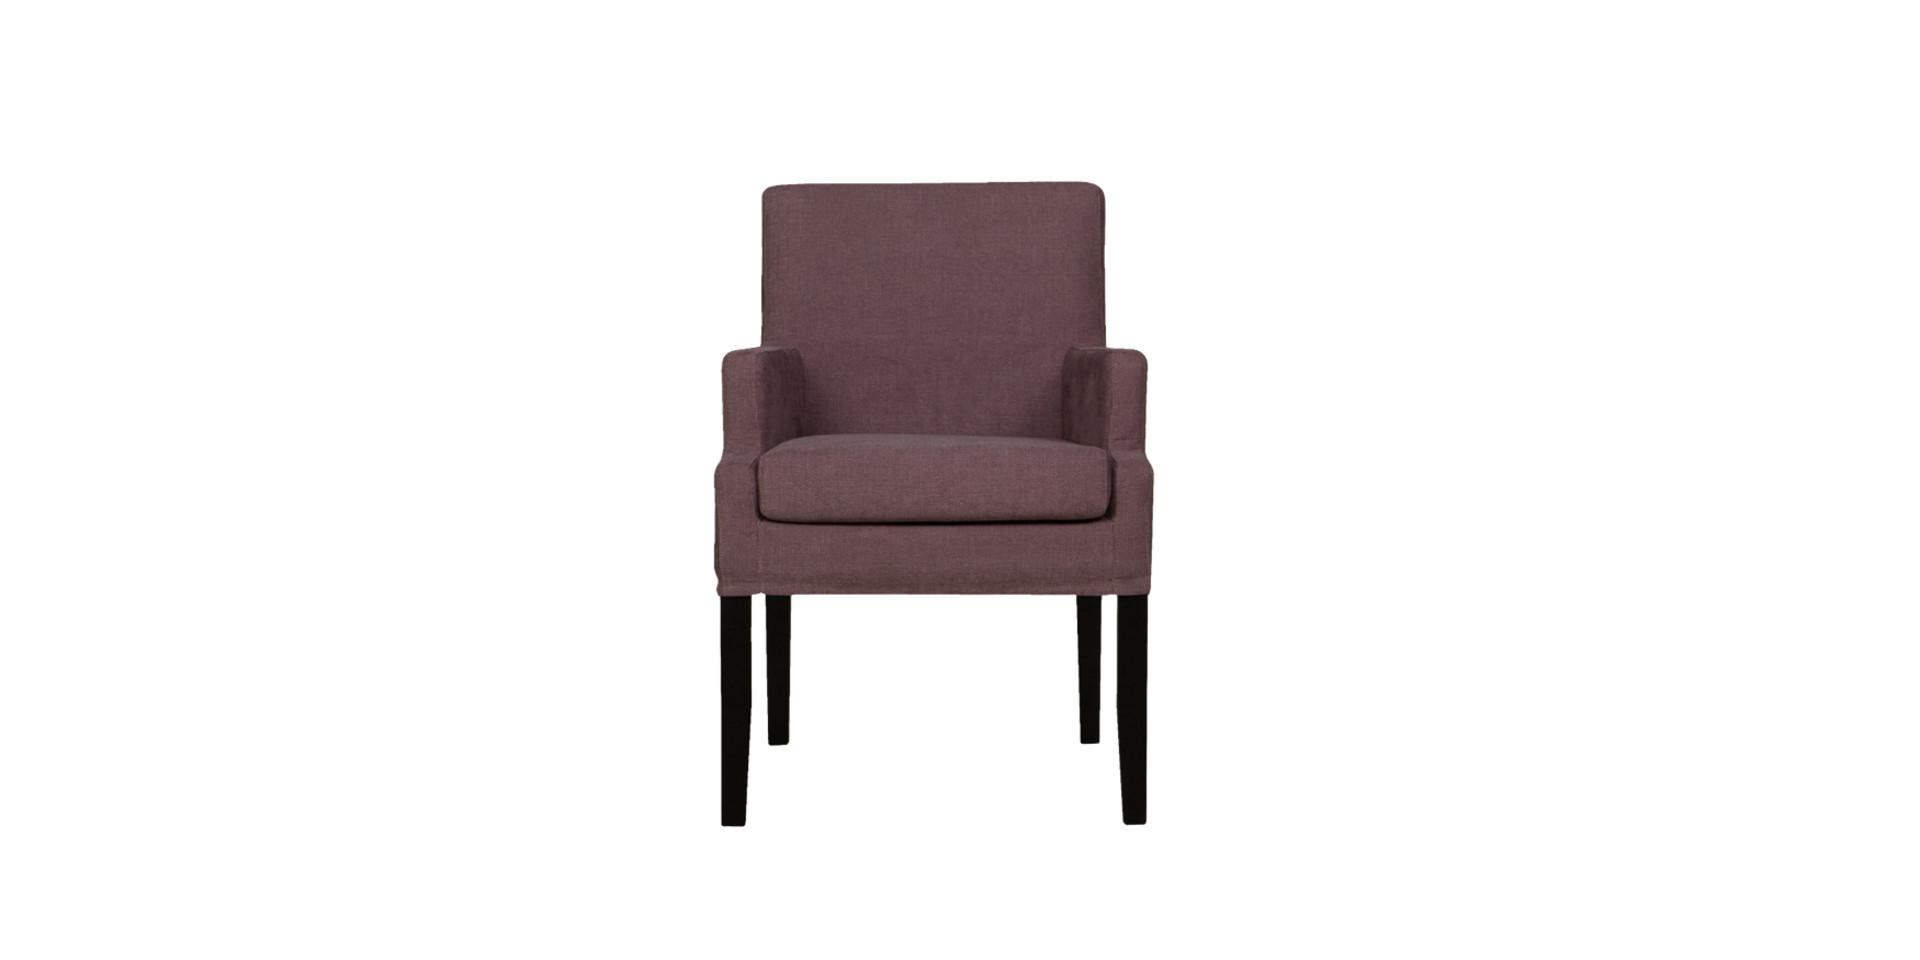 sits-merlin-fauteuil-chair_brest116_plum_1